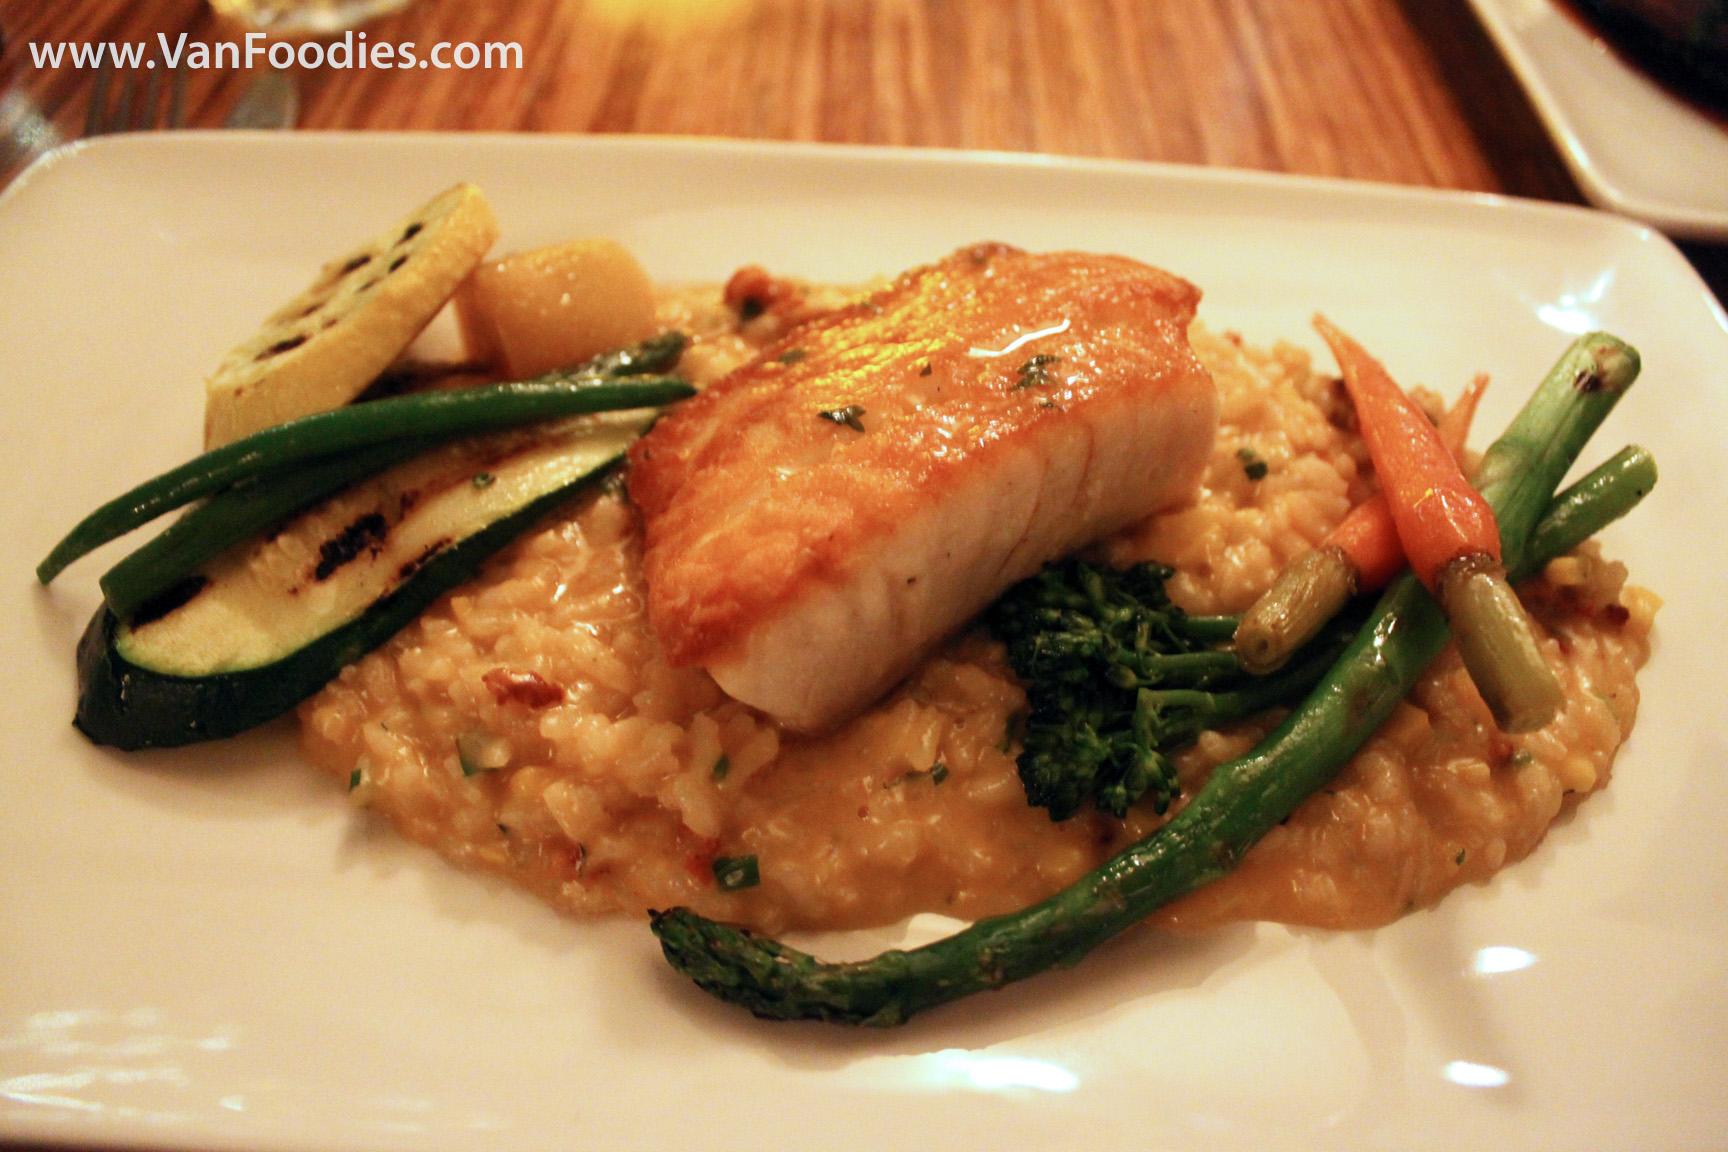 Vancouver Food Blog Restaurant